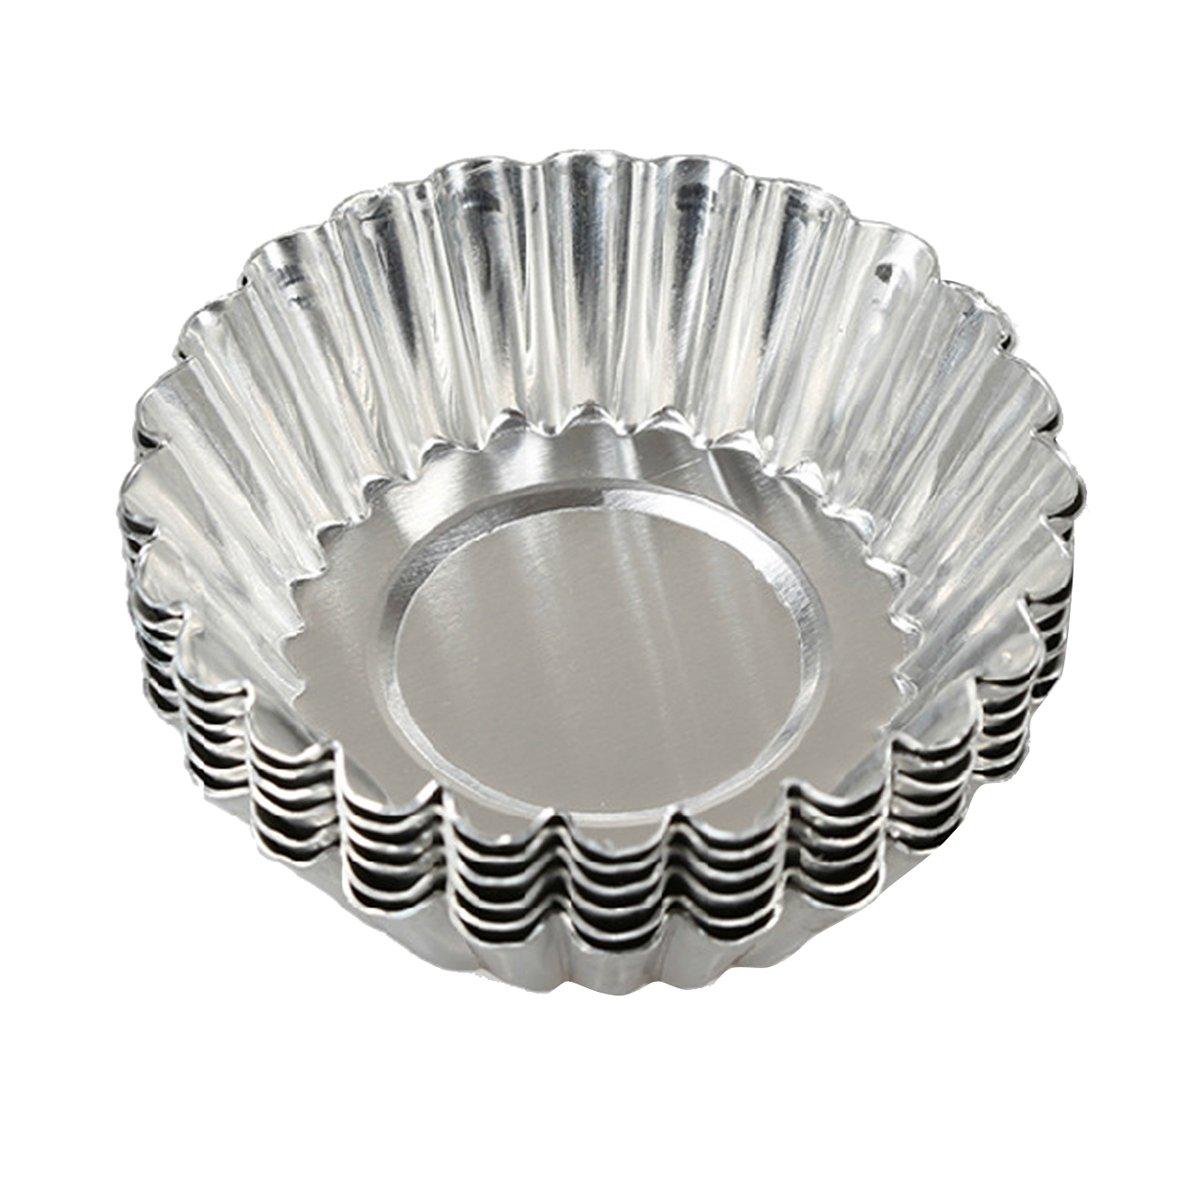 HugeStore 20pcs Silver Tone Aluminum Egg Tart